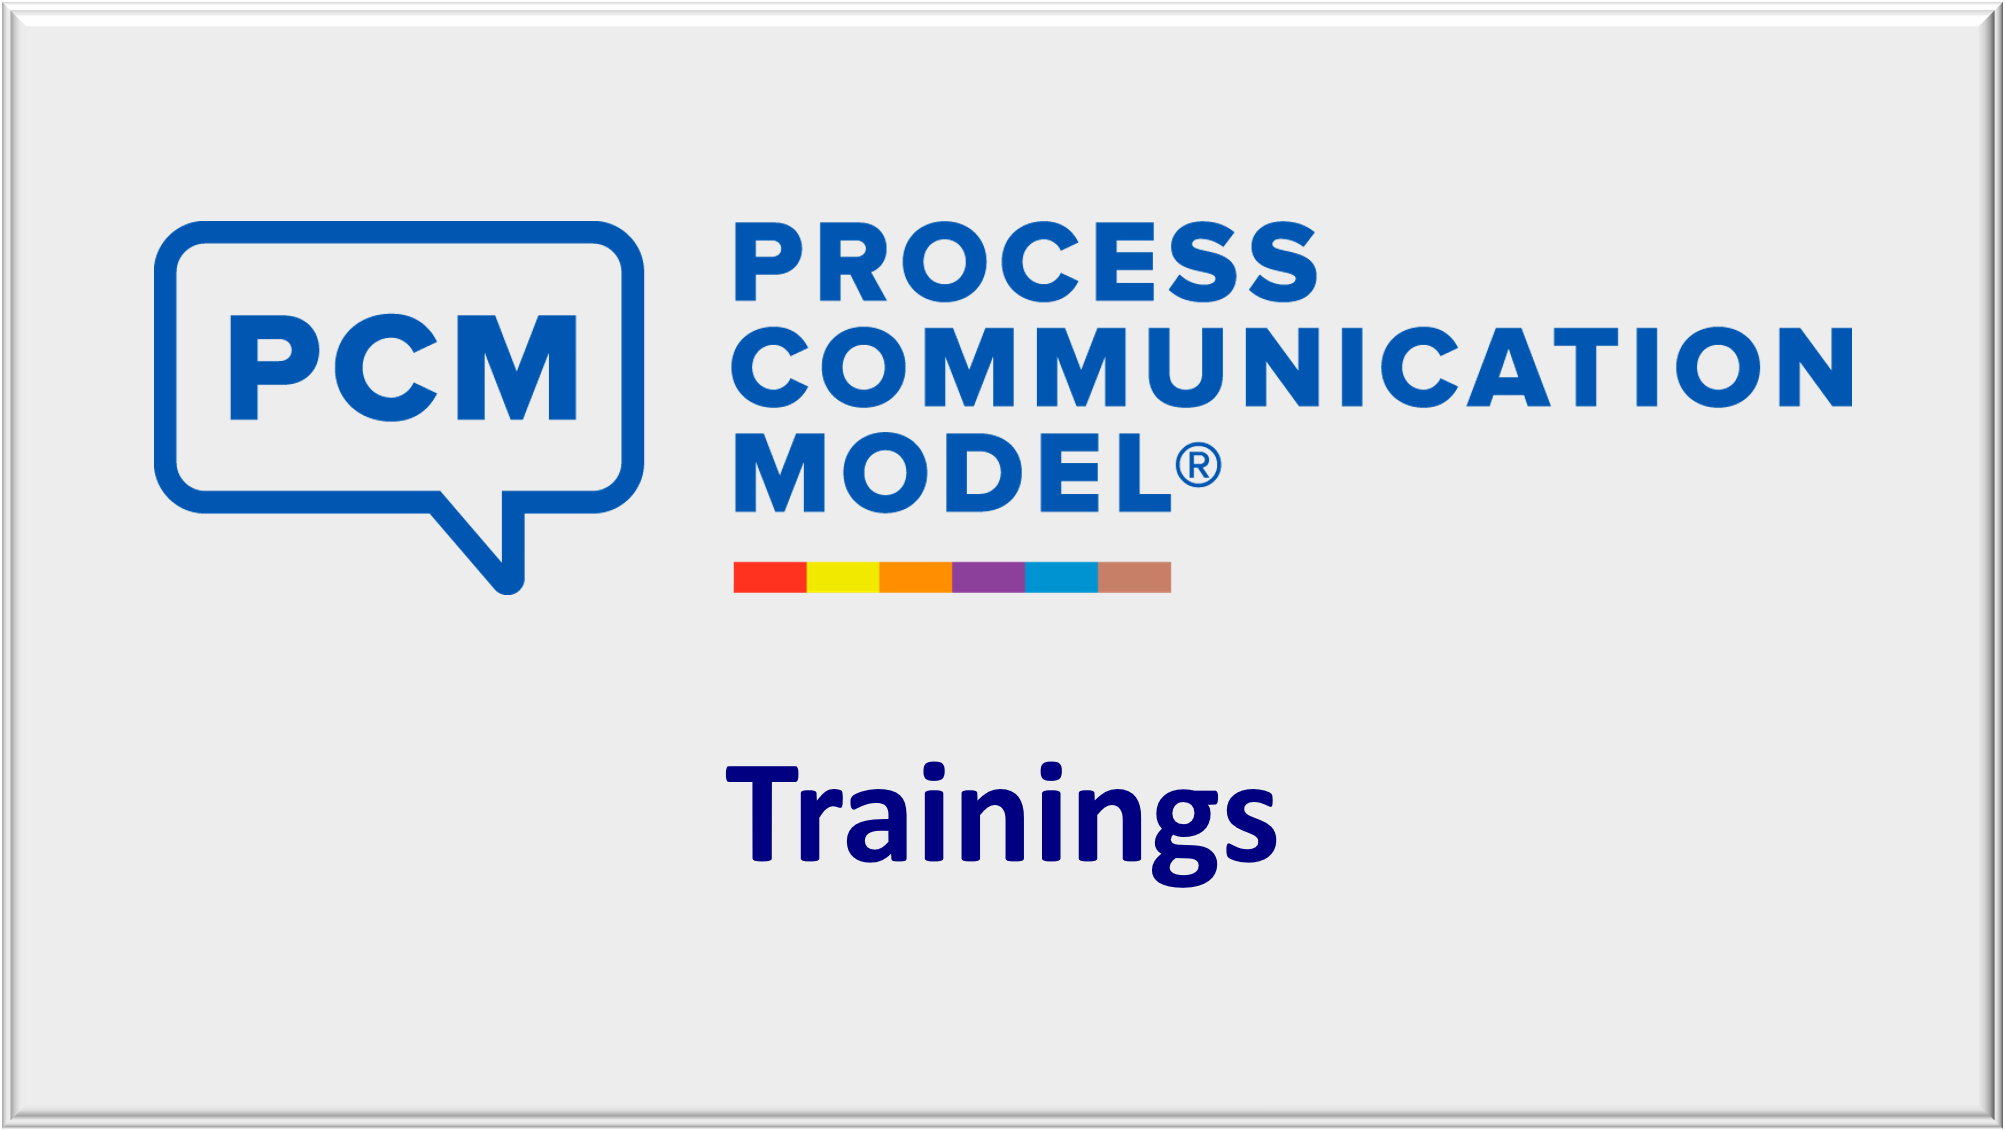 Process Communication Trainings